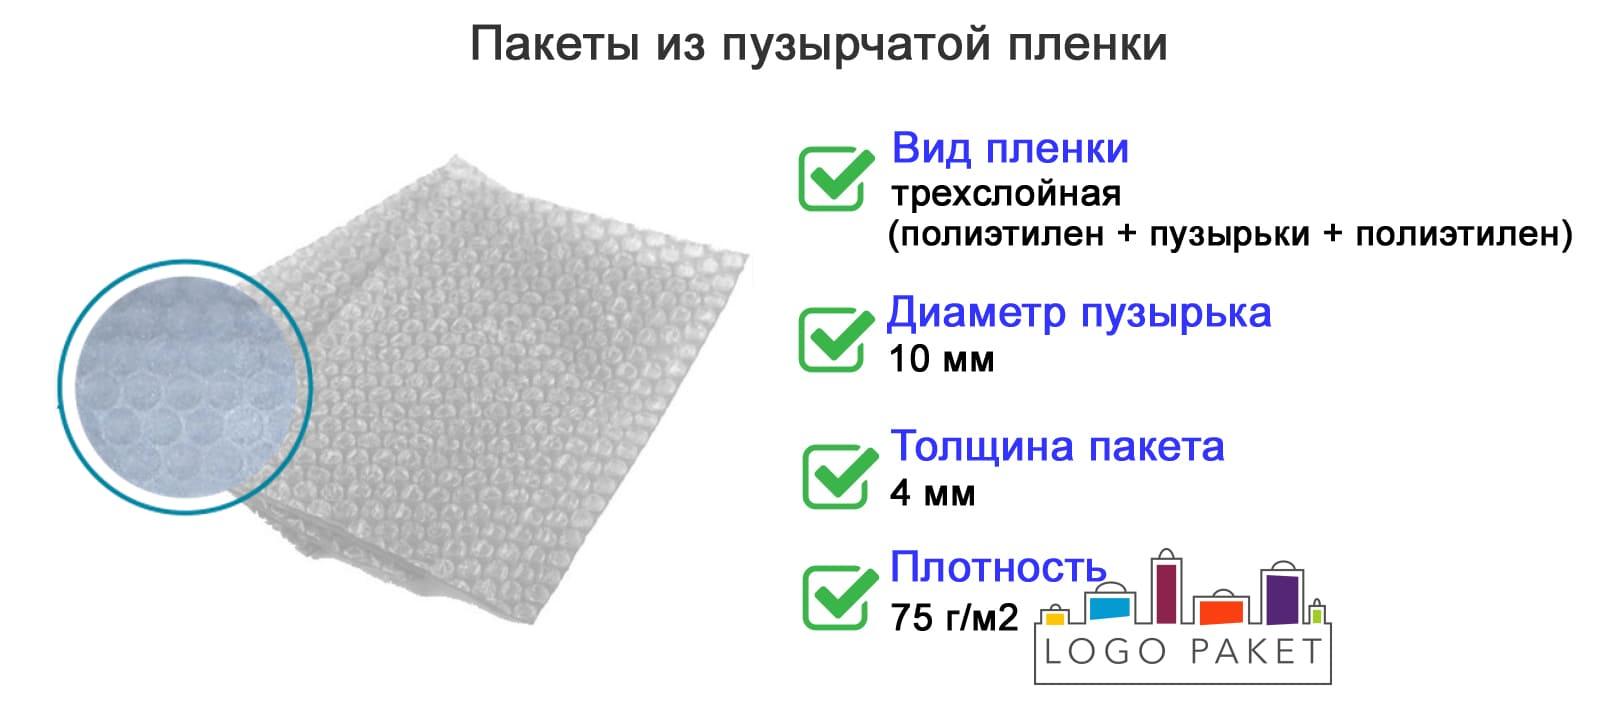 Пакеты из воздушно-пузырчатой плёнки 20х20 инфографика